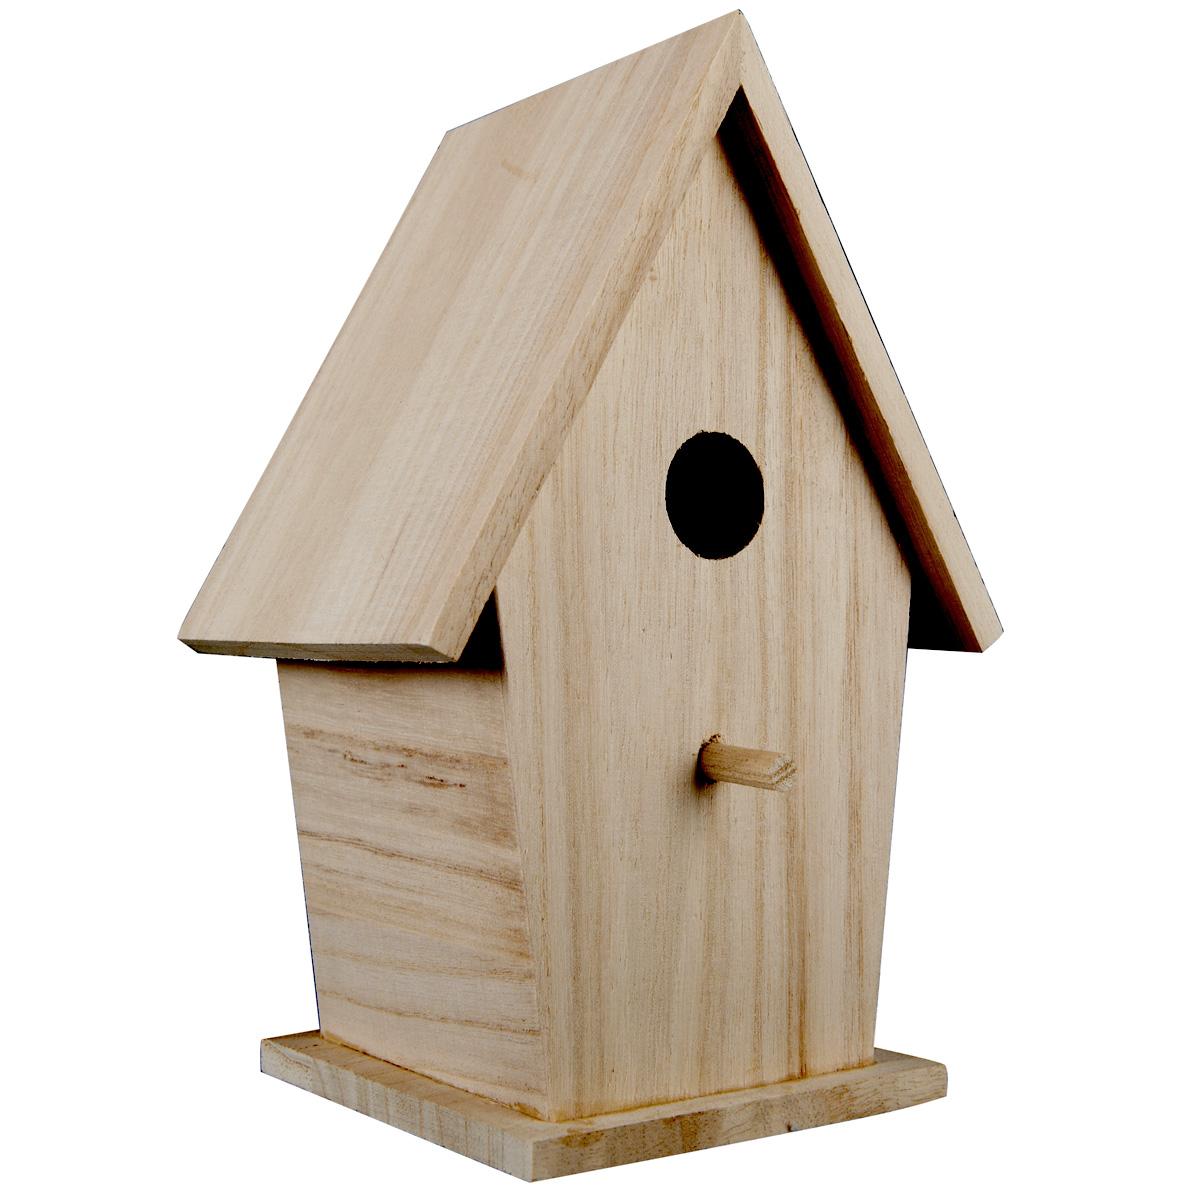 Superb ArtMinds Tall Wood Birdhouse